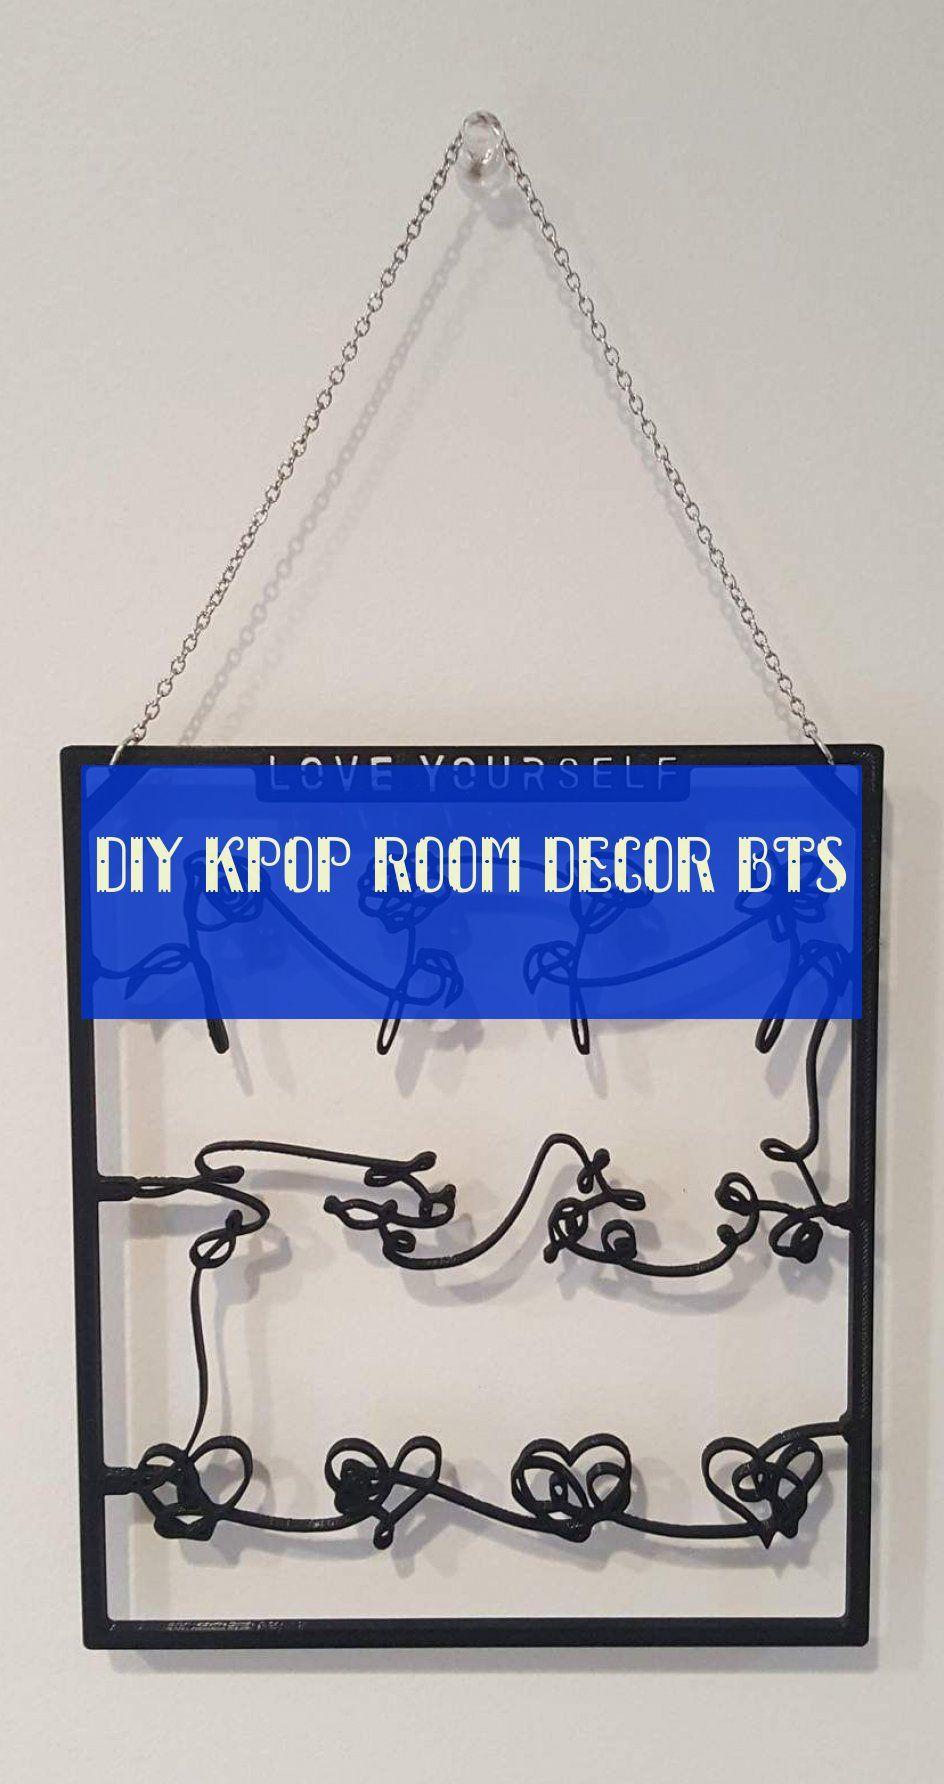 Diy Kpop Room Decor Bts Diy Kpop Bts Decor De La Salle Kpop Room Decor Bts Room Diy Kpop Diy